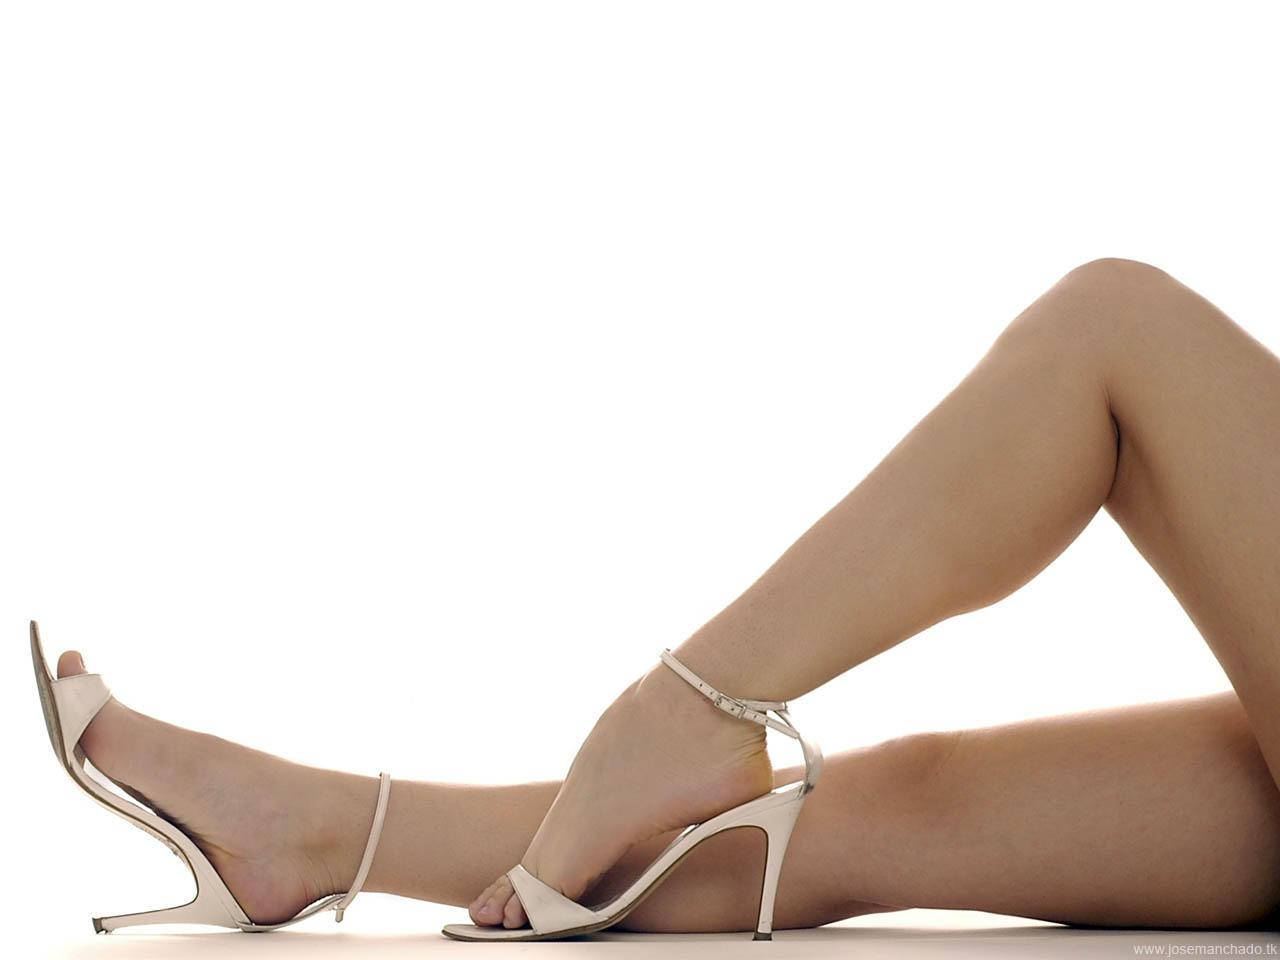 nice legs by josemanchado